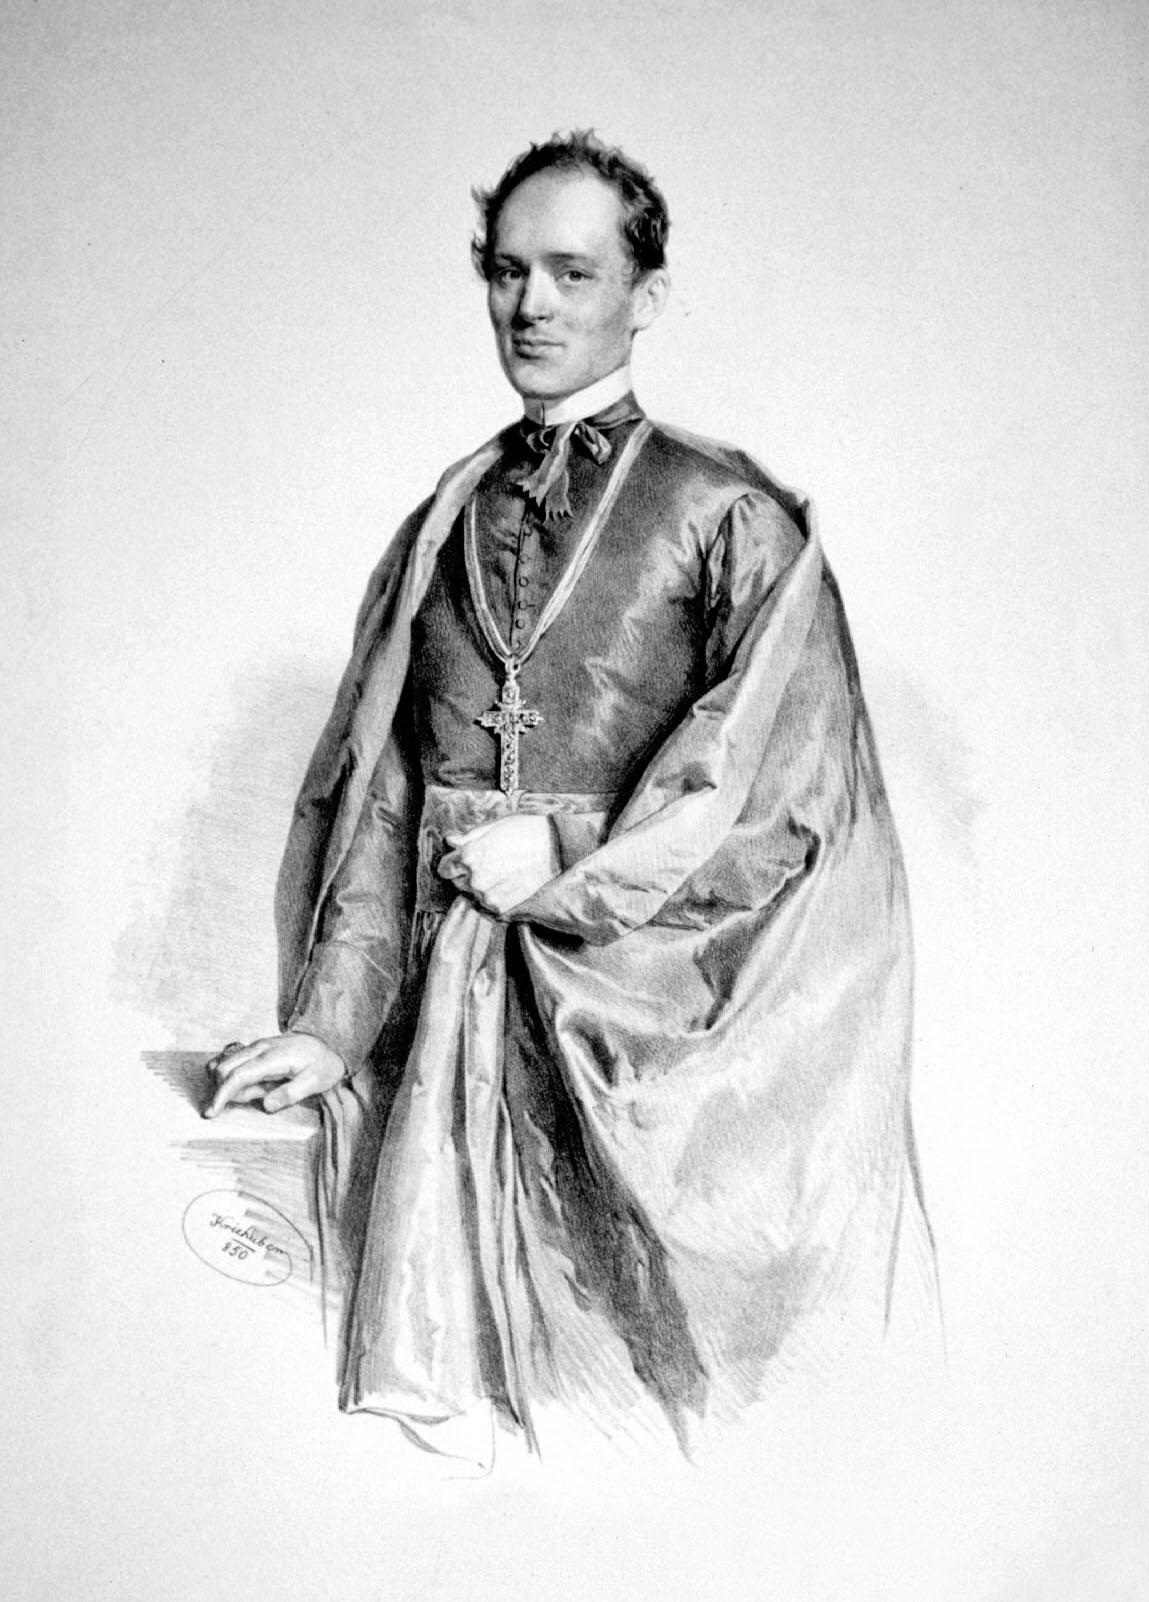 J. J. Strossmayer 1850